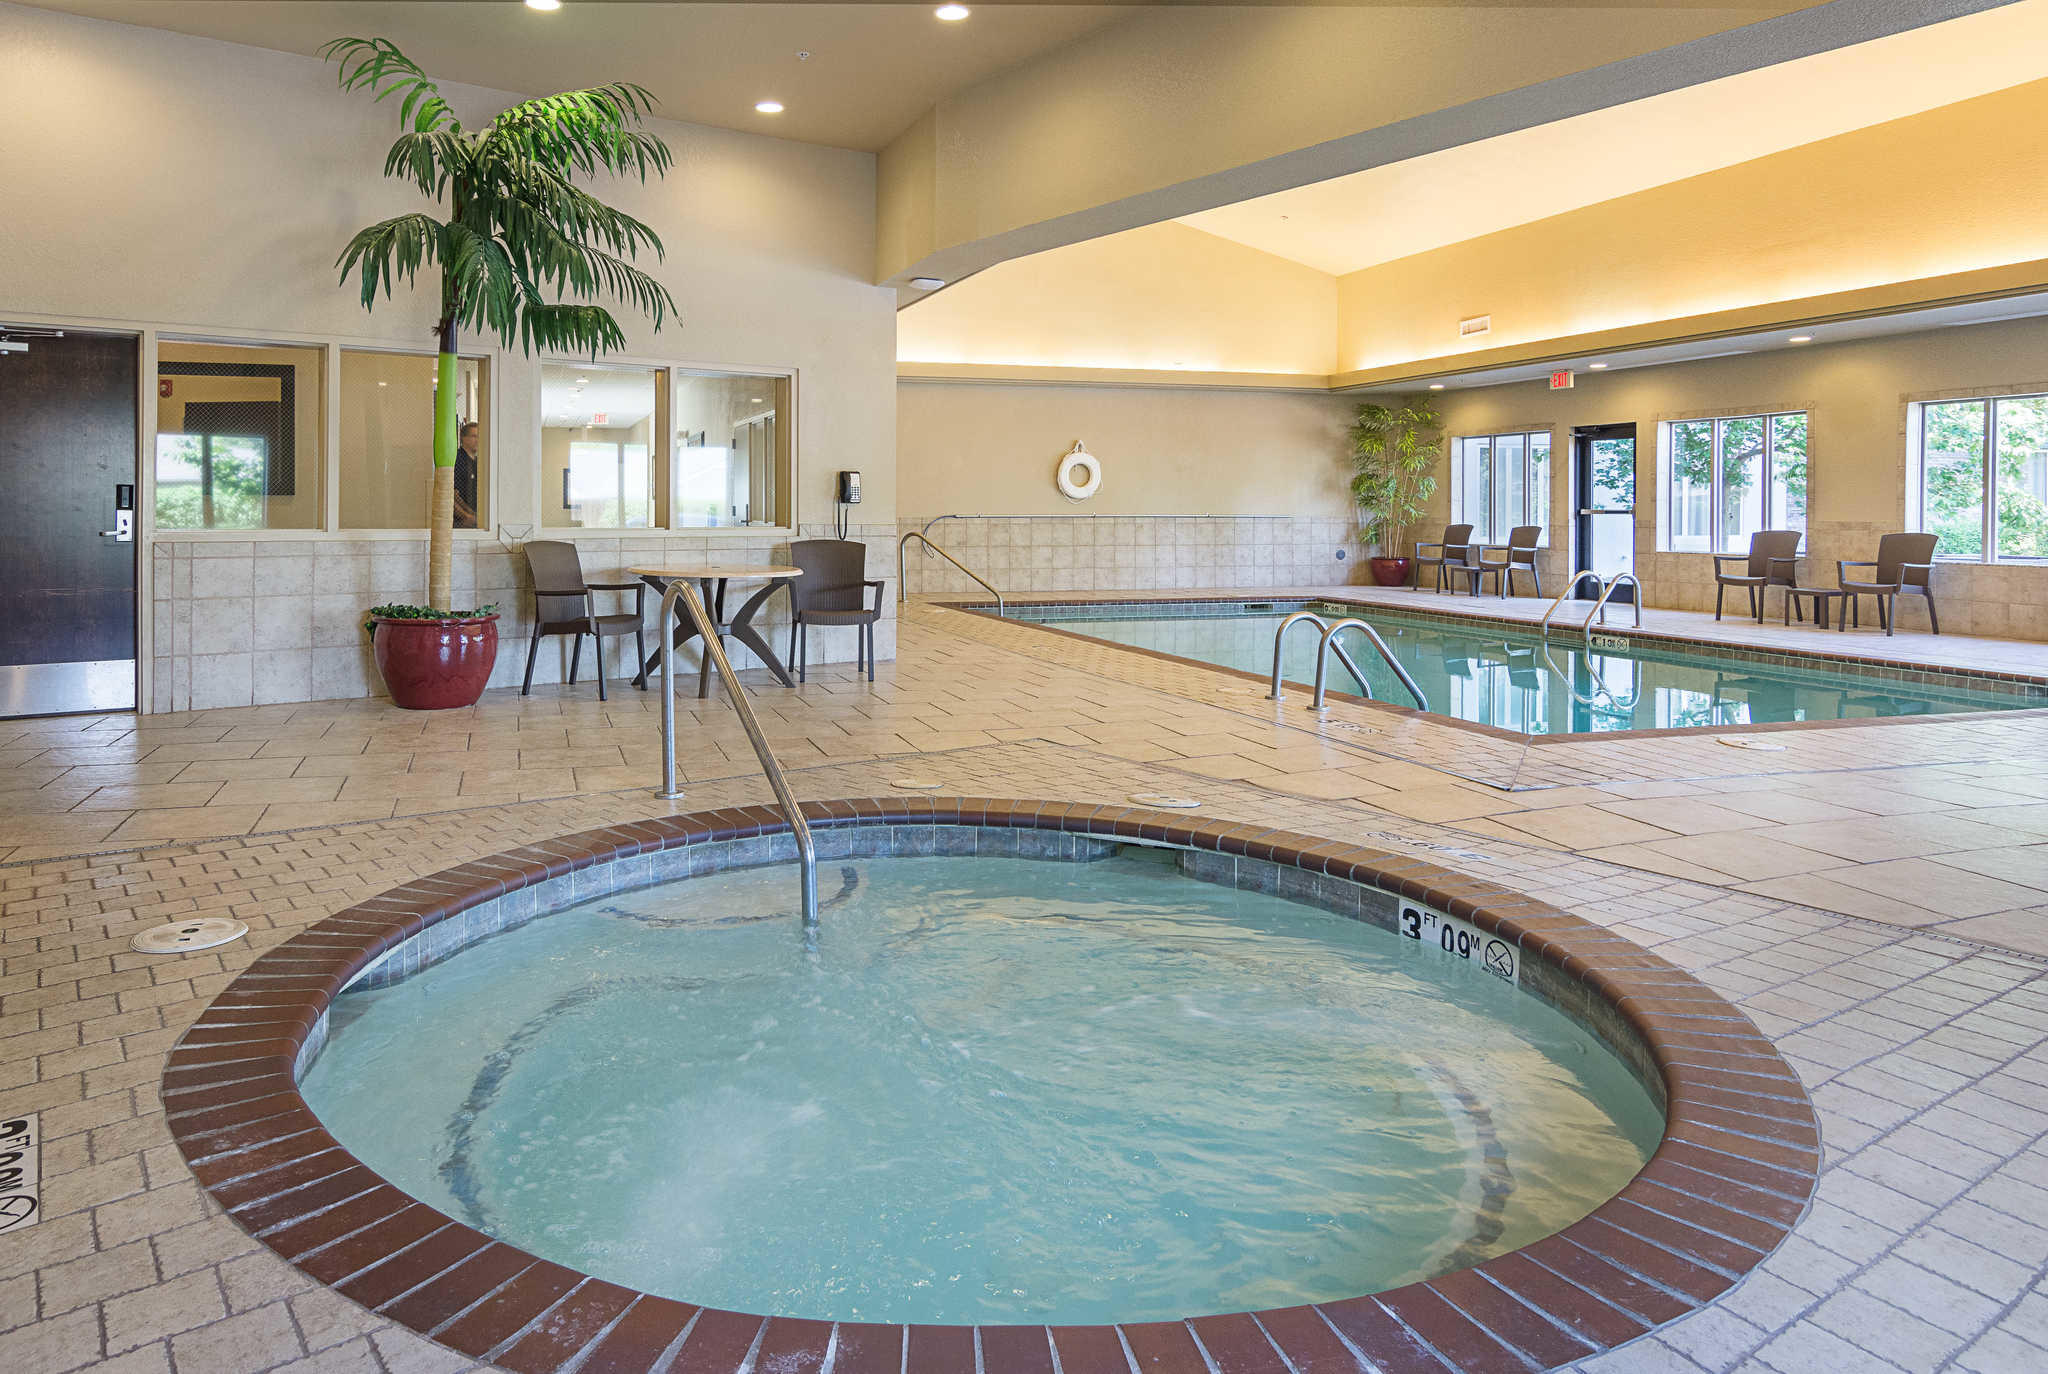 Comfort inn bentonville in bentonville ar 72712 for Bentonville pool